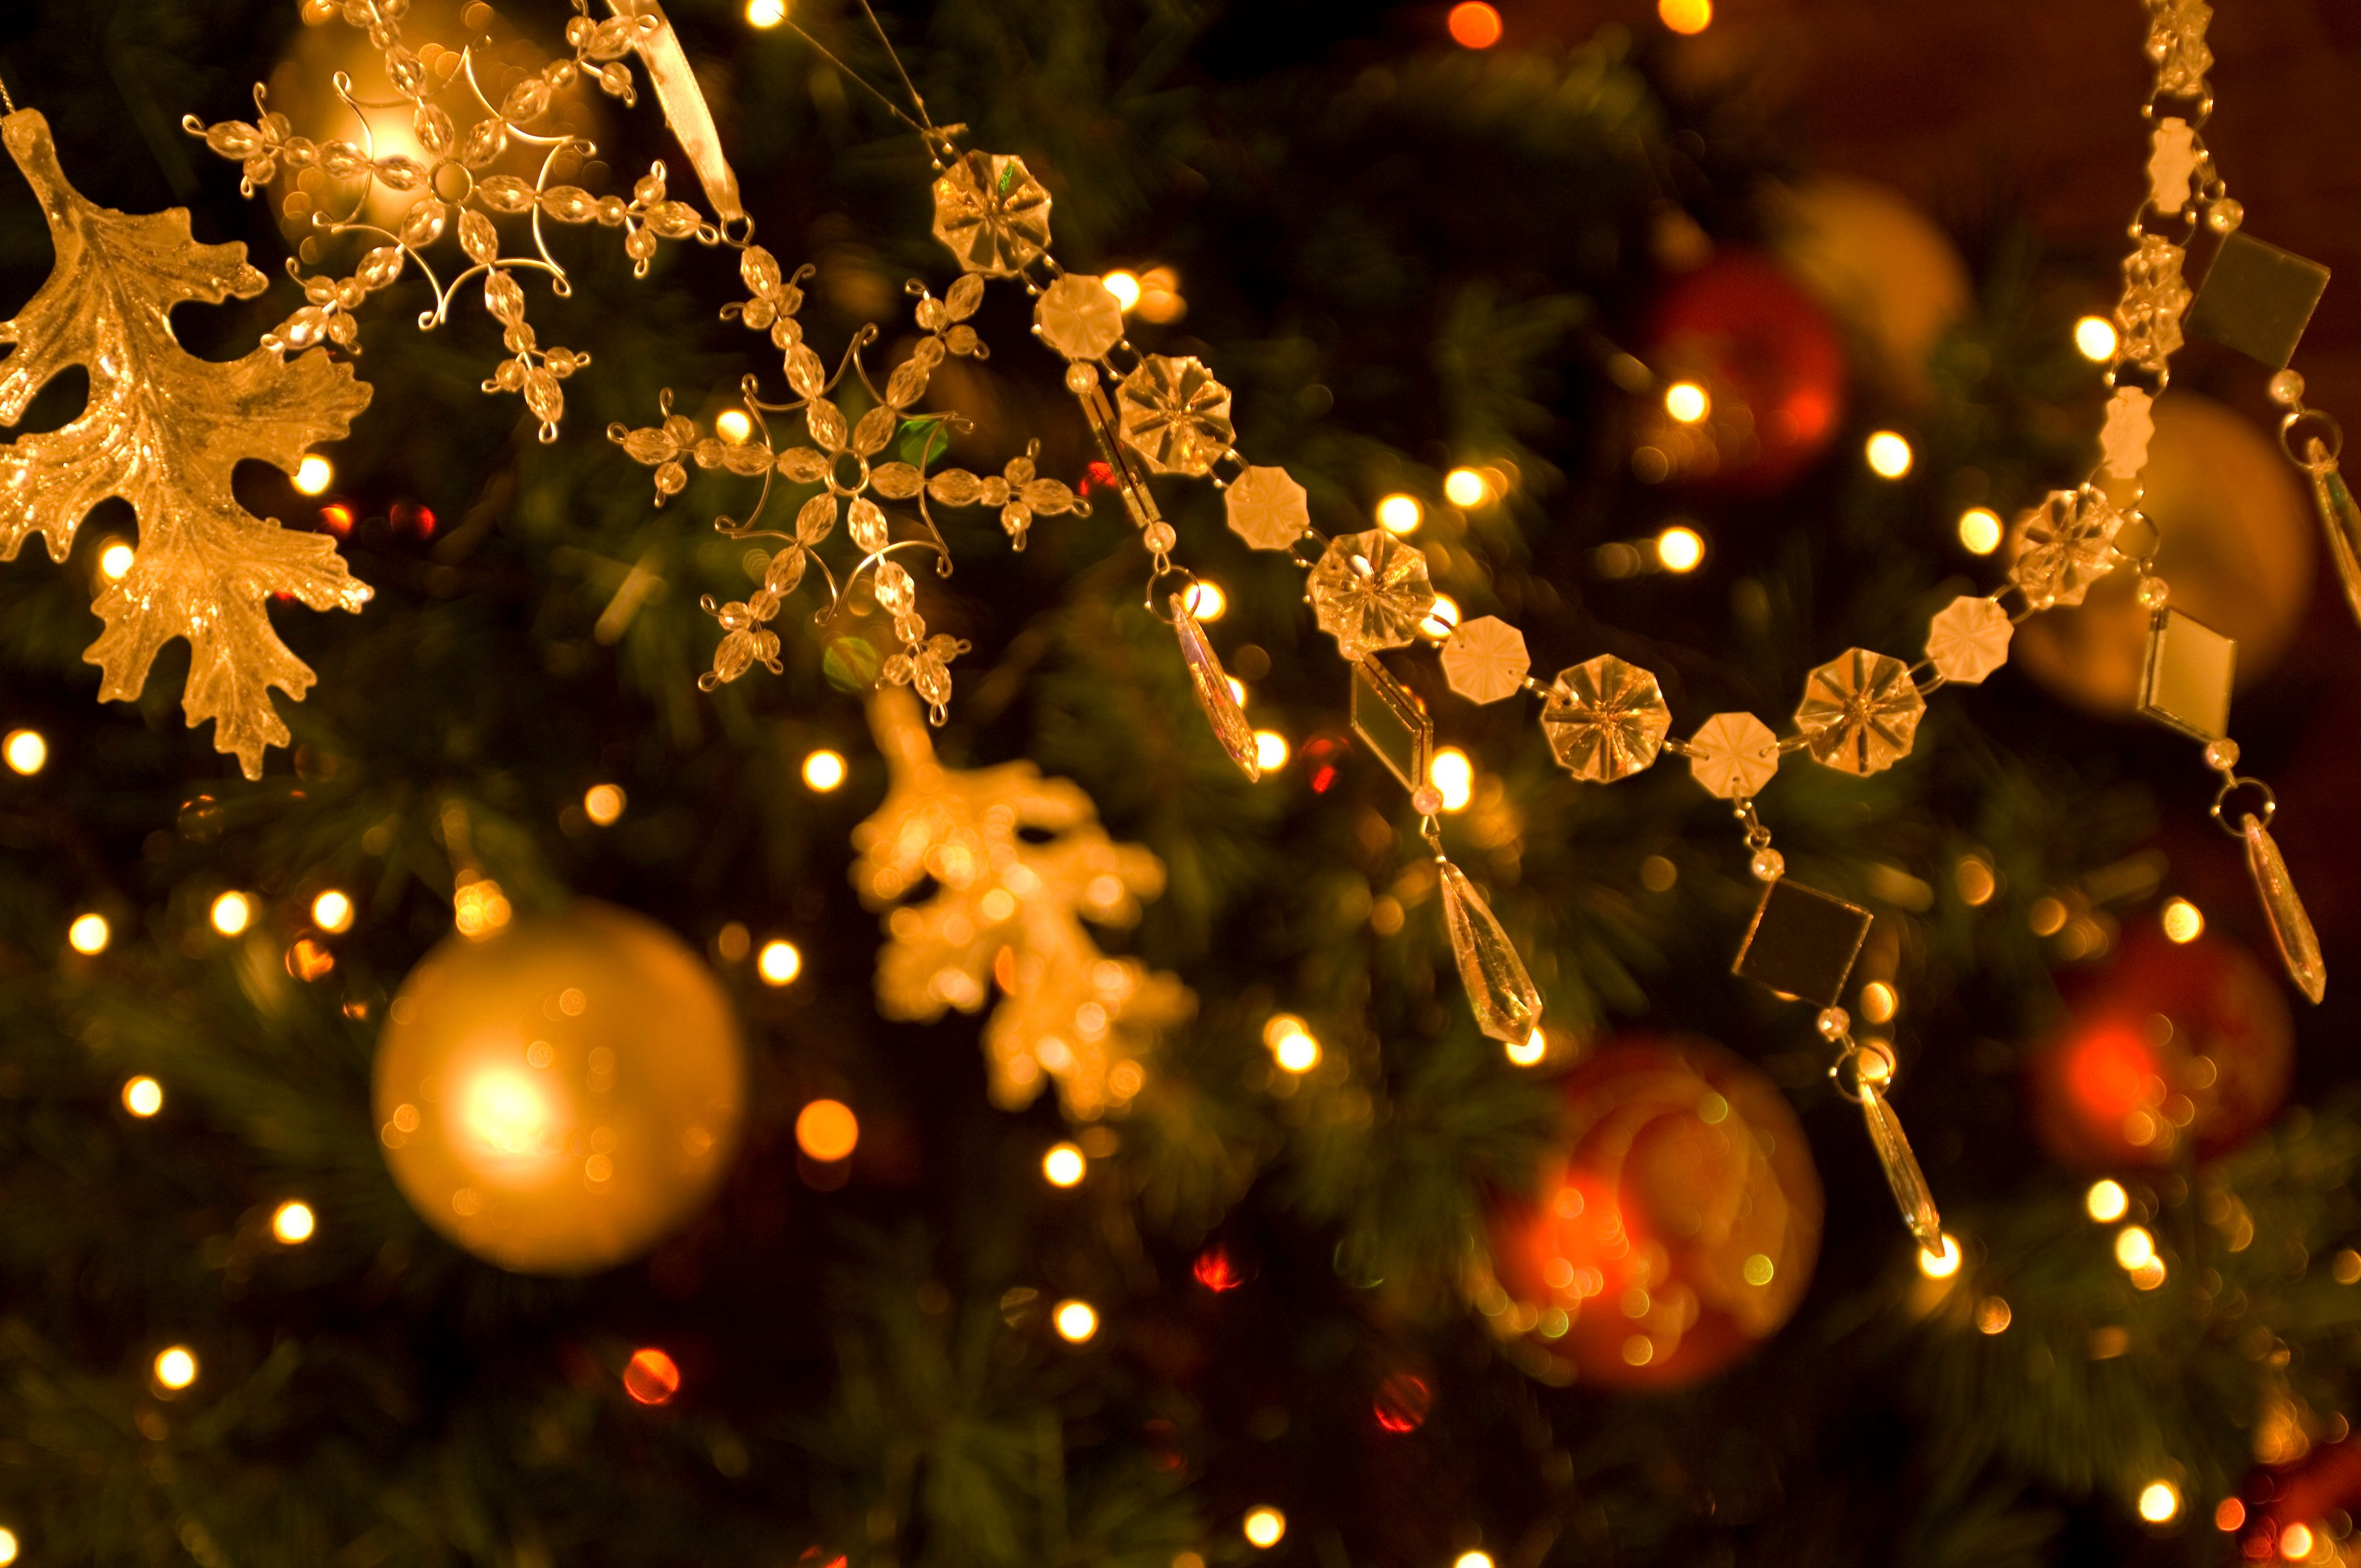 Neighborhood Celebrates Christmas Early To Fulfill Dying Woman's